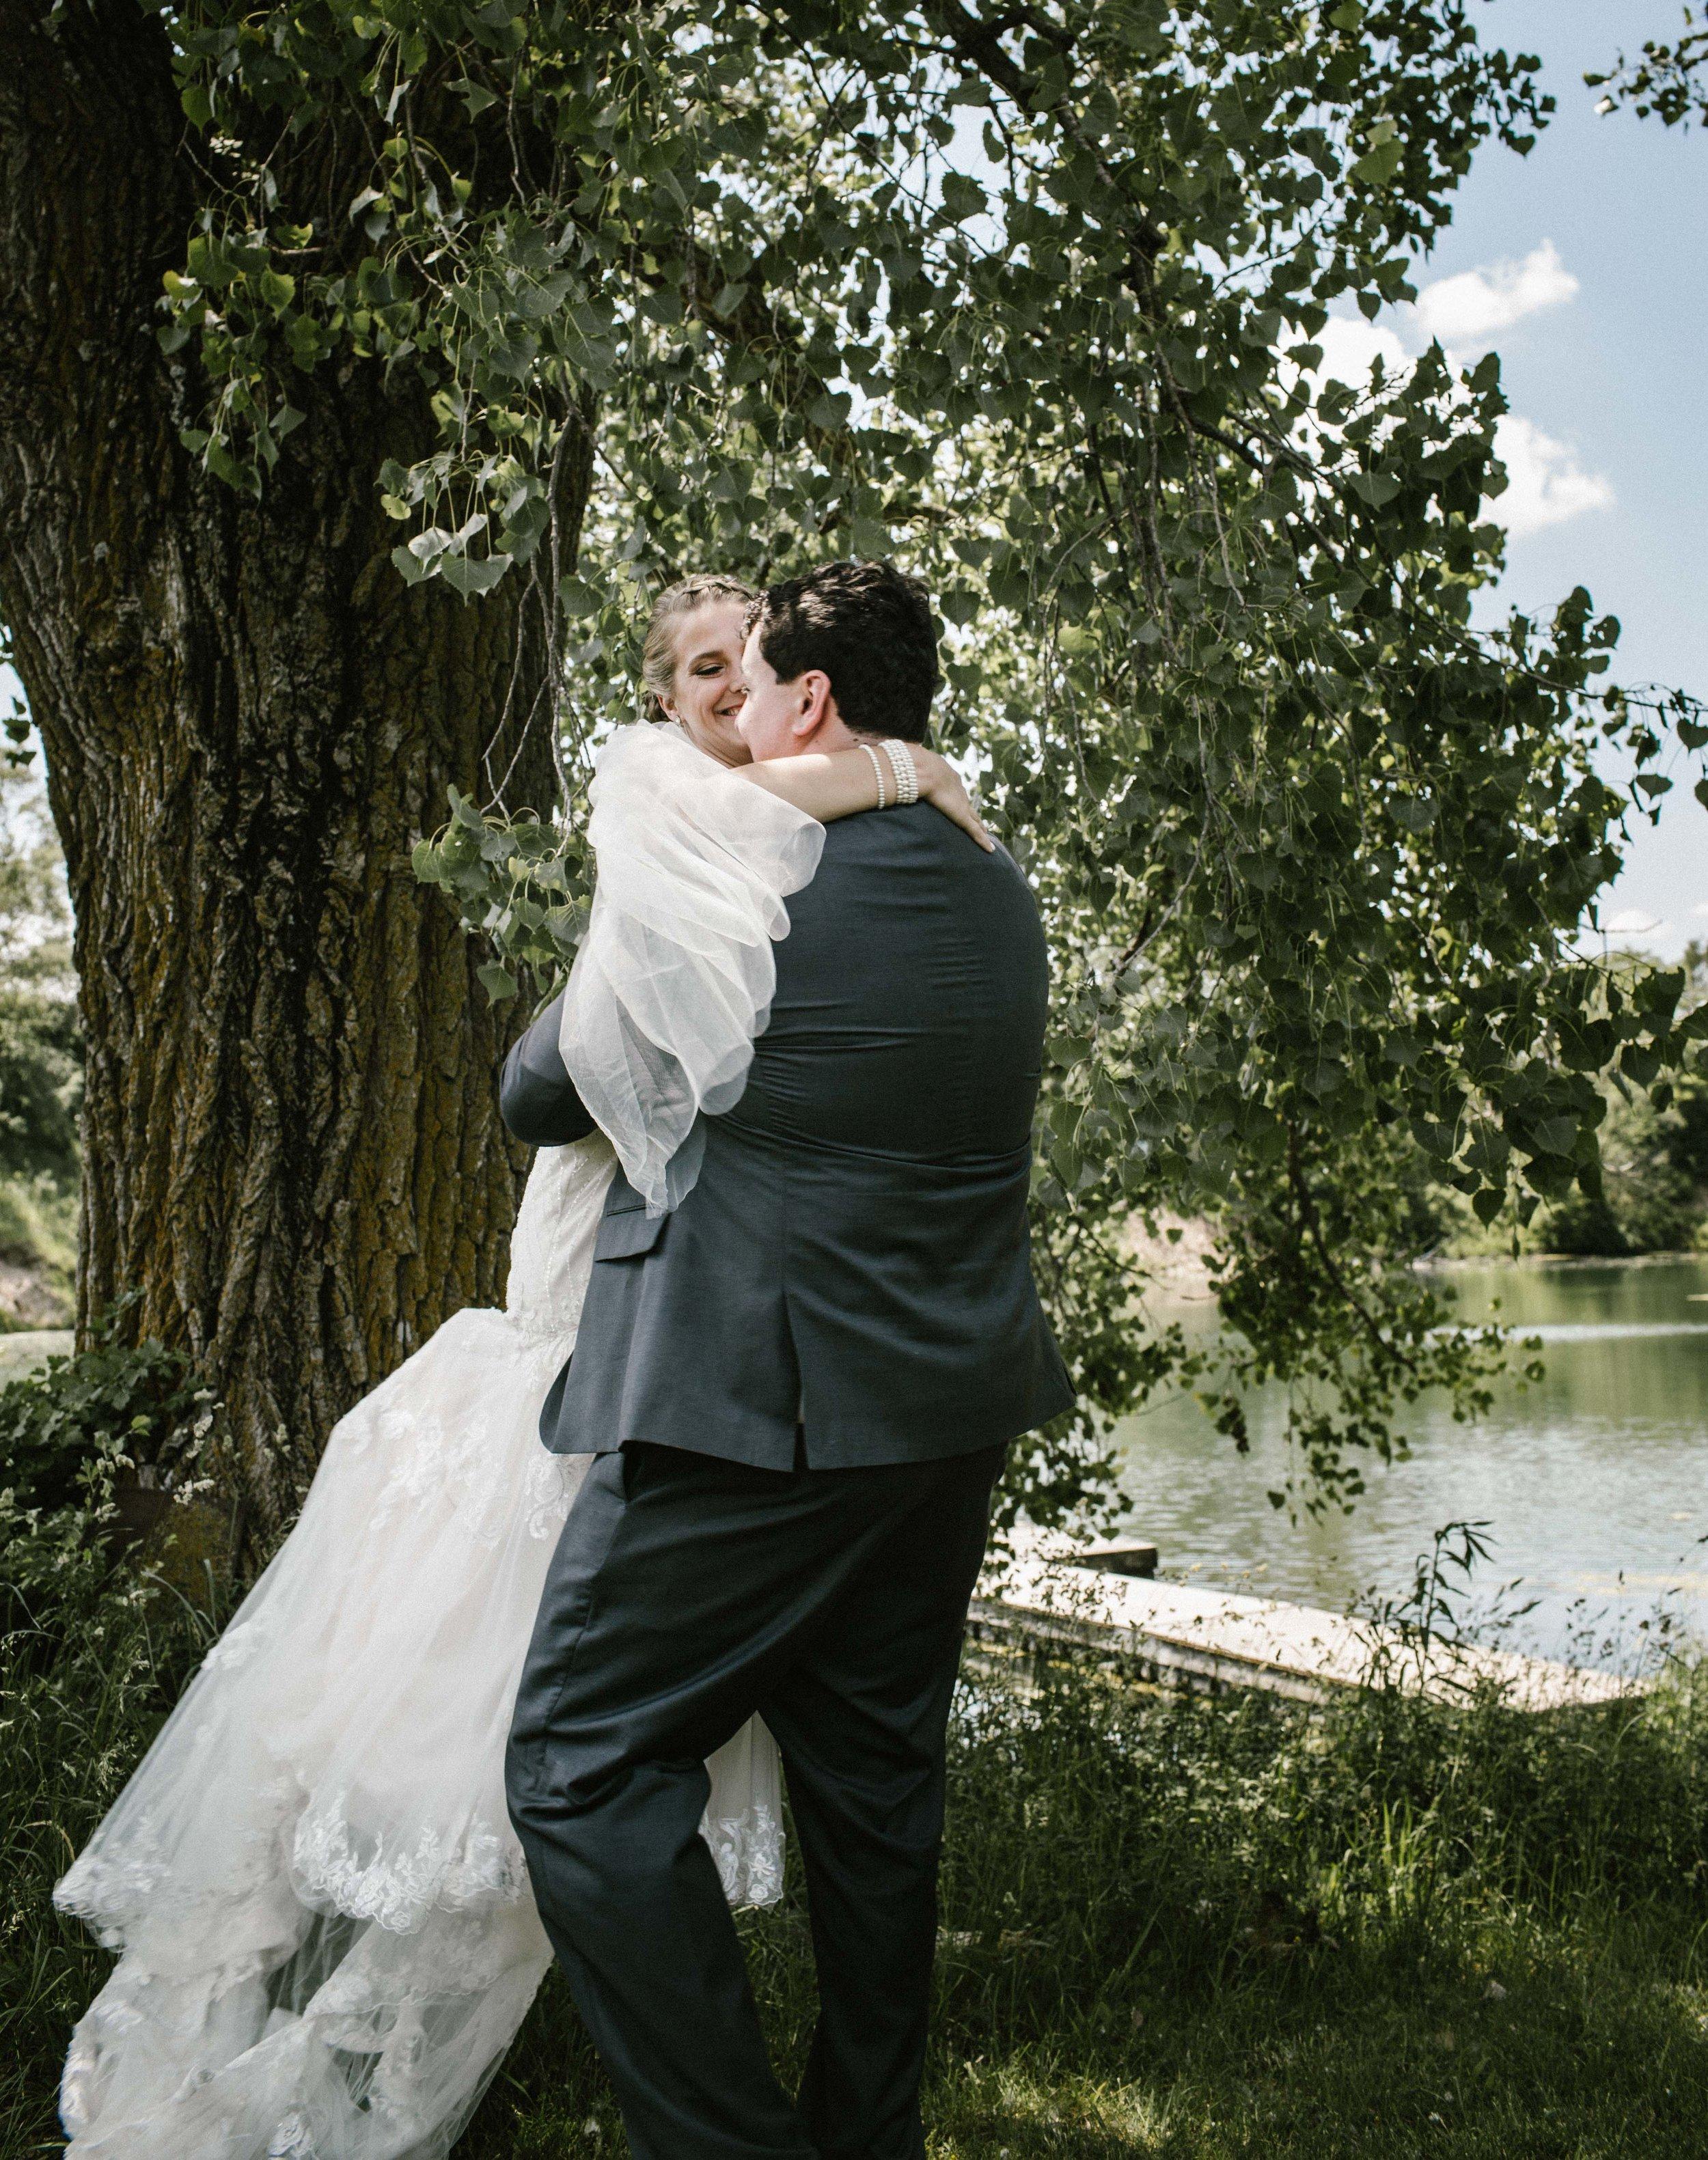 Iowa wedding_Dawn McClannan Photo-22.jpg